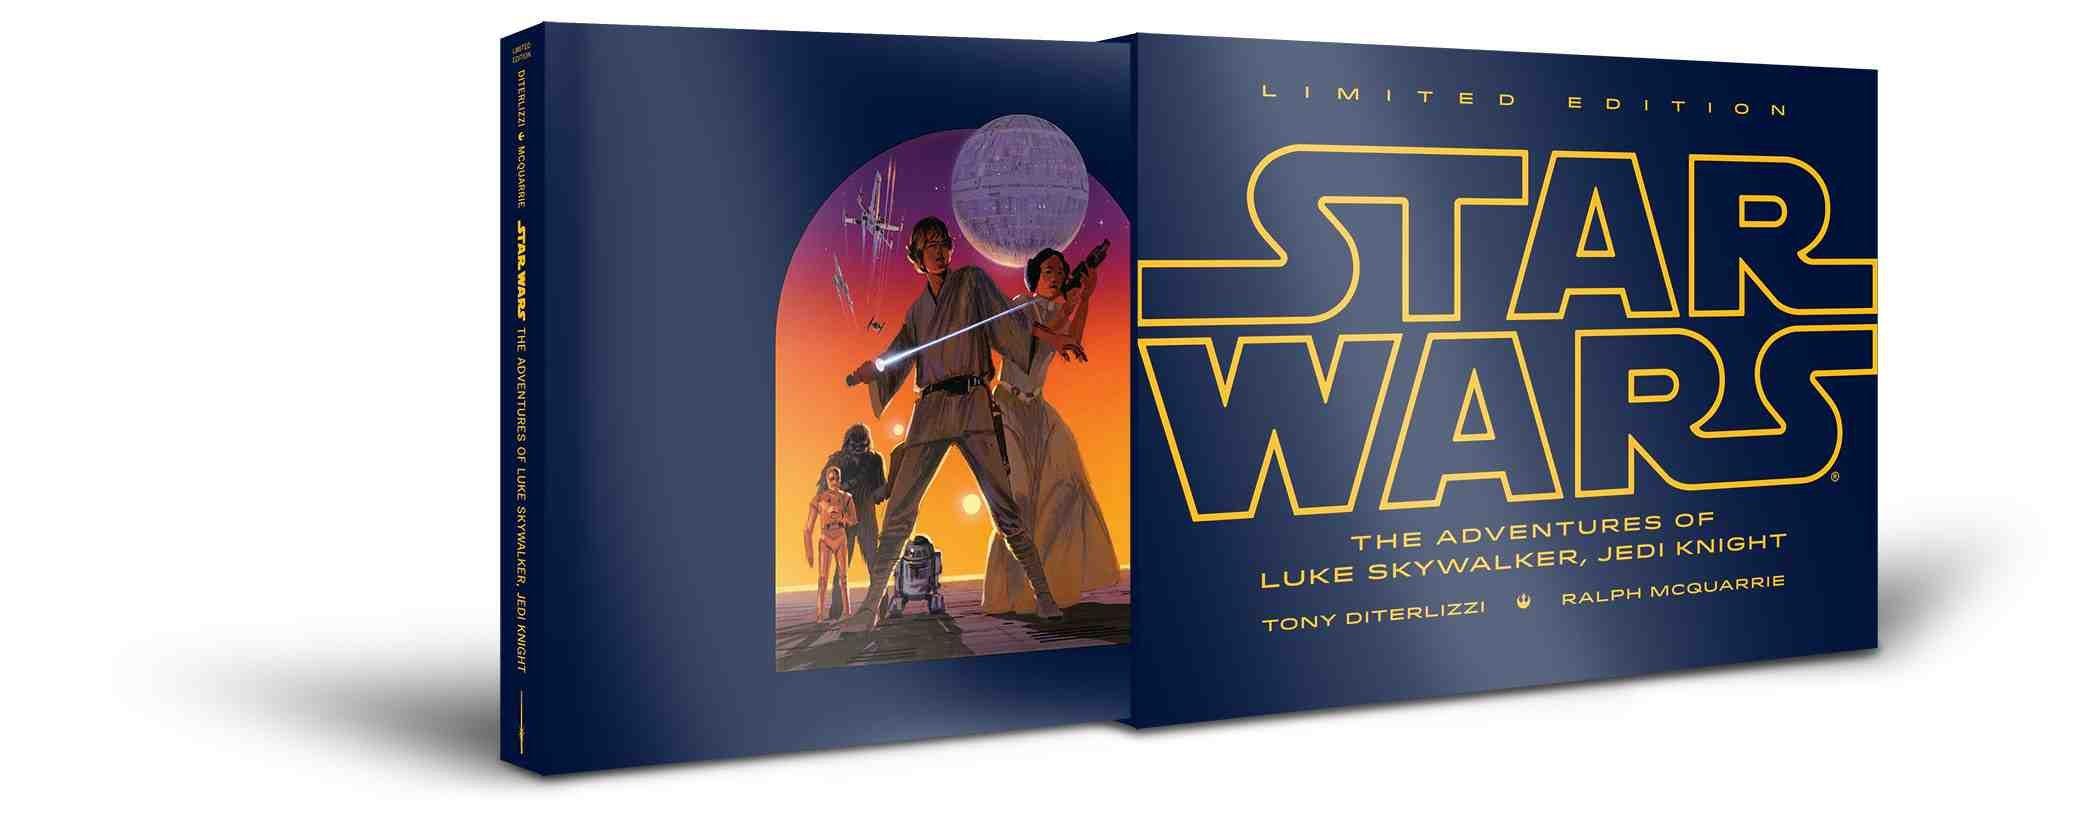 The Adventures of Luke Skywalker, Jedi Knight (Limited Edition) (Star Wars)